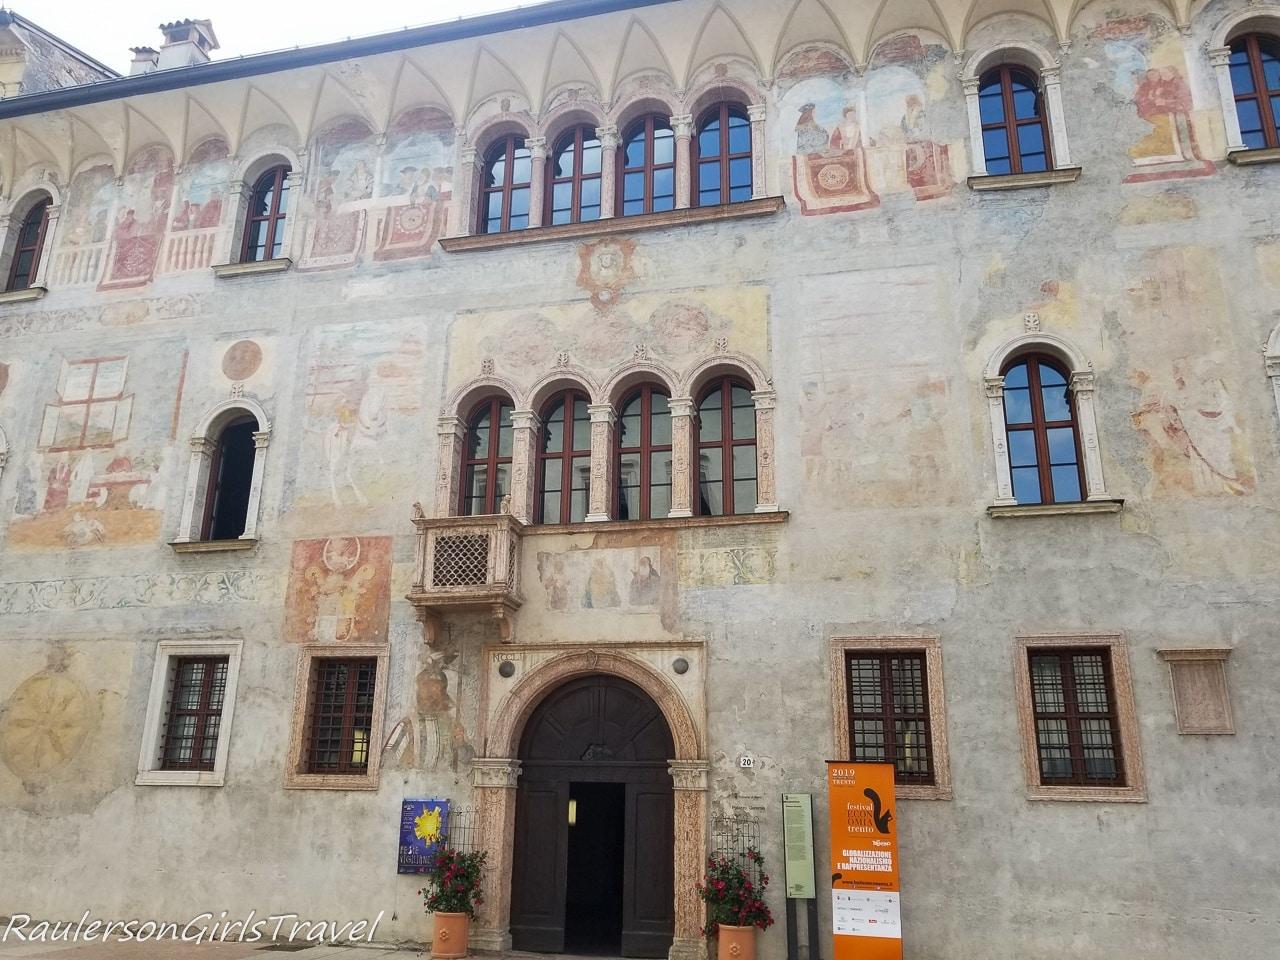 Palazzo Geremia - Trento Travel Guide